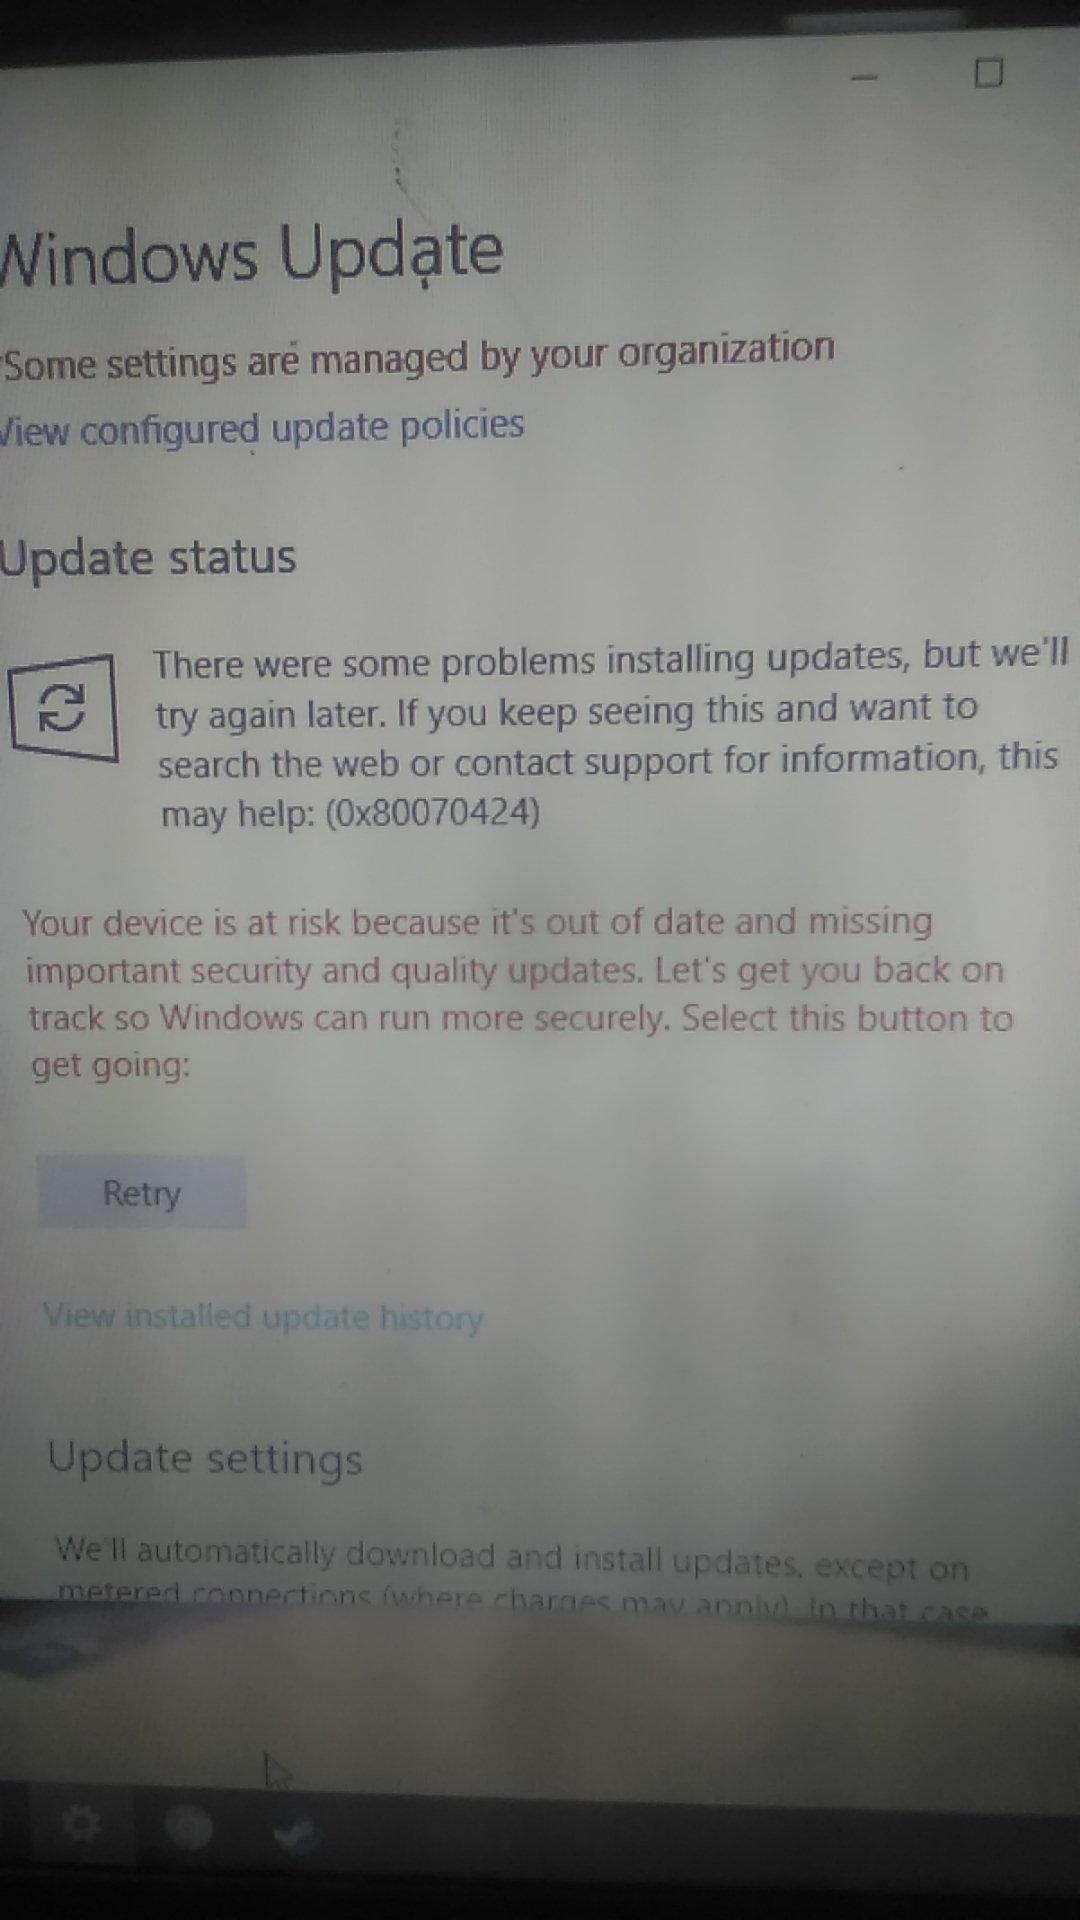 Windows update error 0x80070424 - Microsoft Community